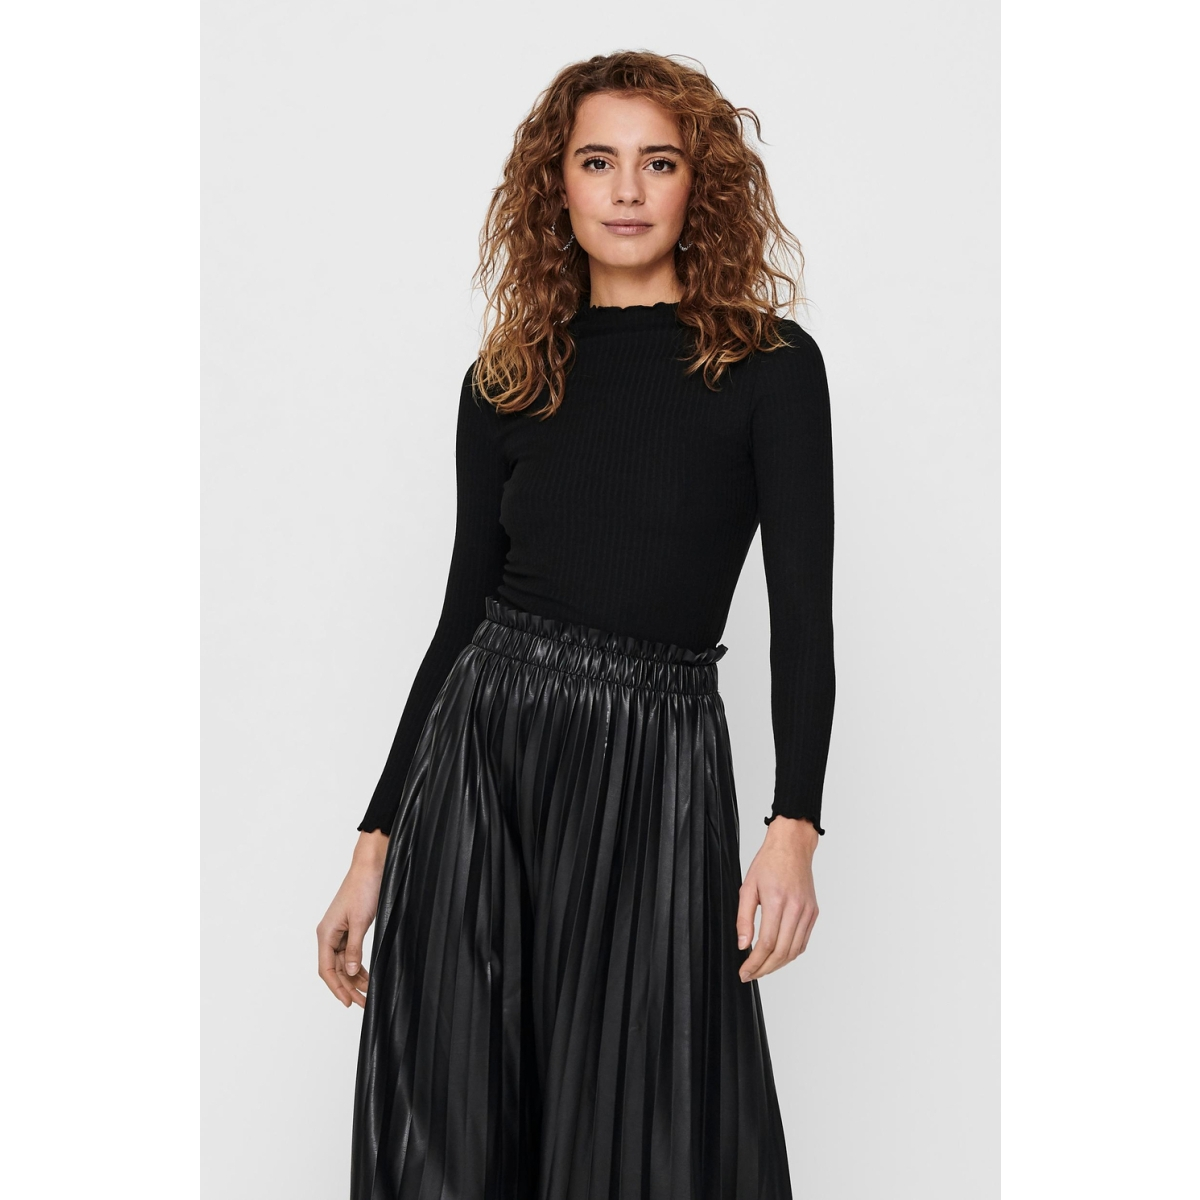 onlemma l/s high neck top noos jrs 15180040 only trui black